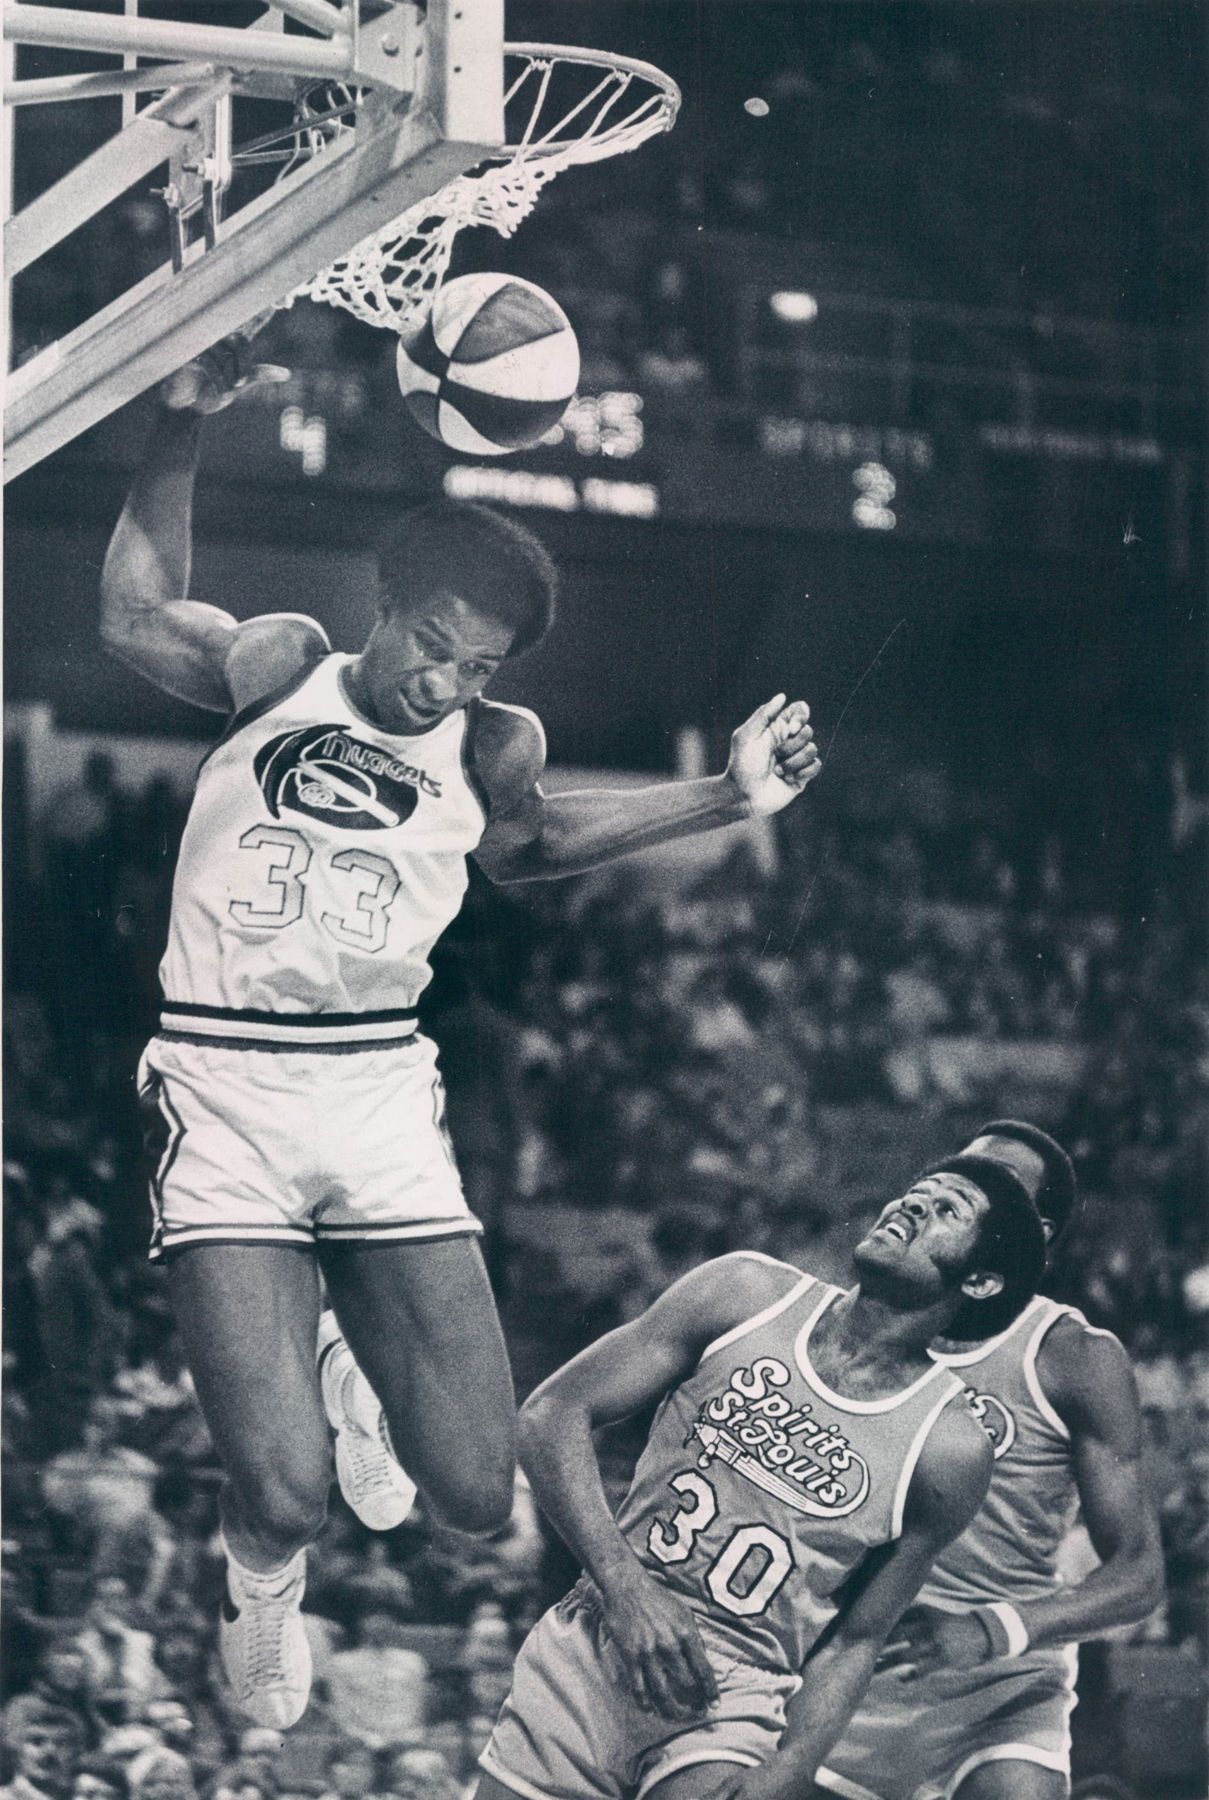 David Thompson The Skywalker David Thompson Aba Basketball Players